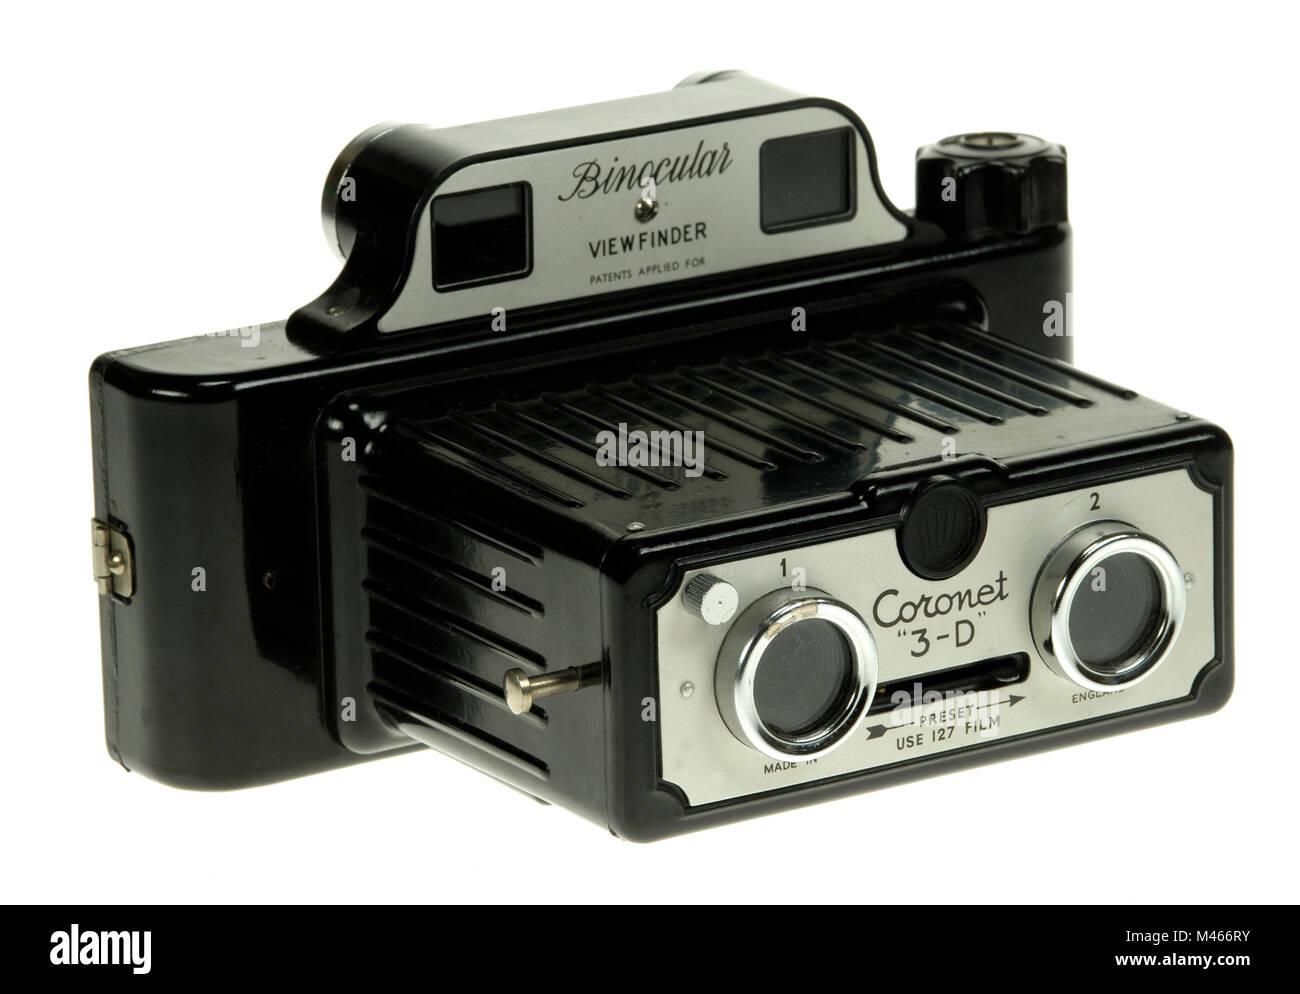 Coronet 3-D stereo camera c1953 - Stock Image